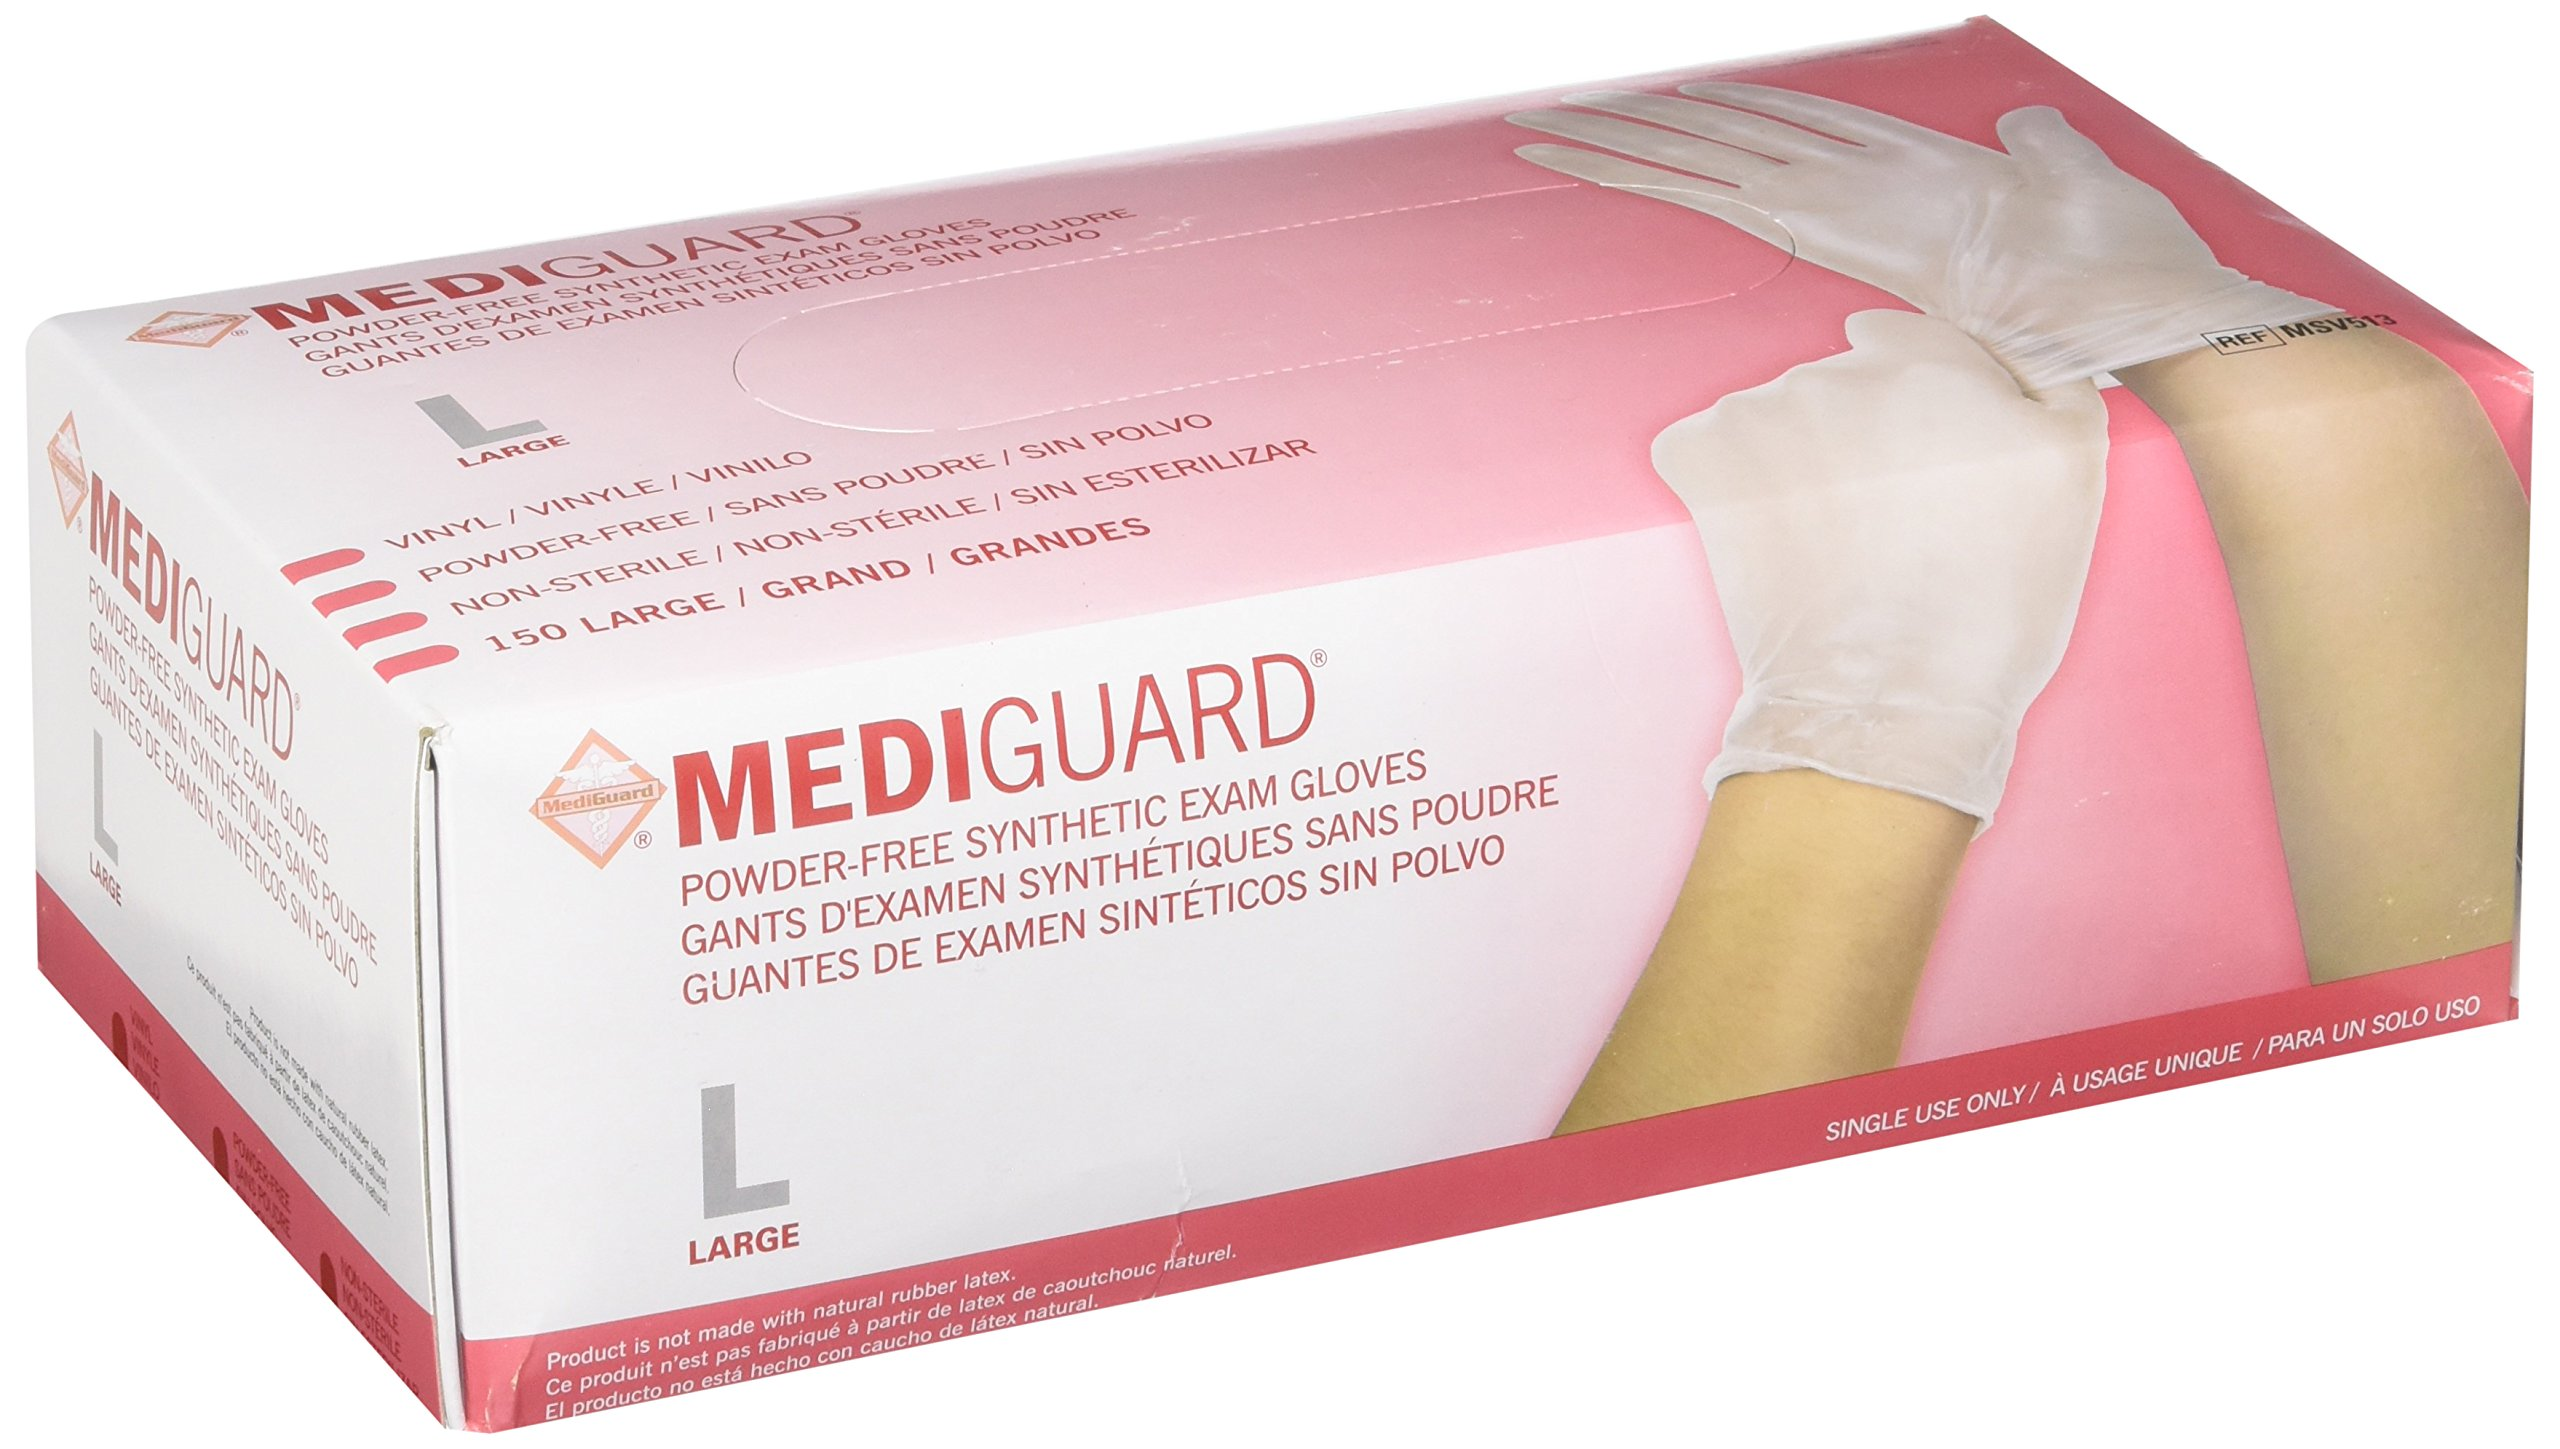 MediGuard Vinyl Synthetic Exam Gloves Size: Large